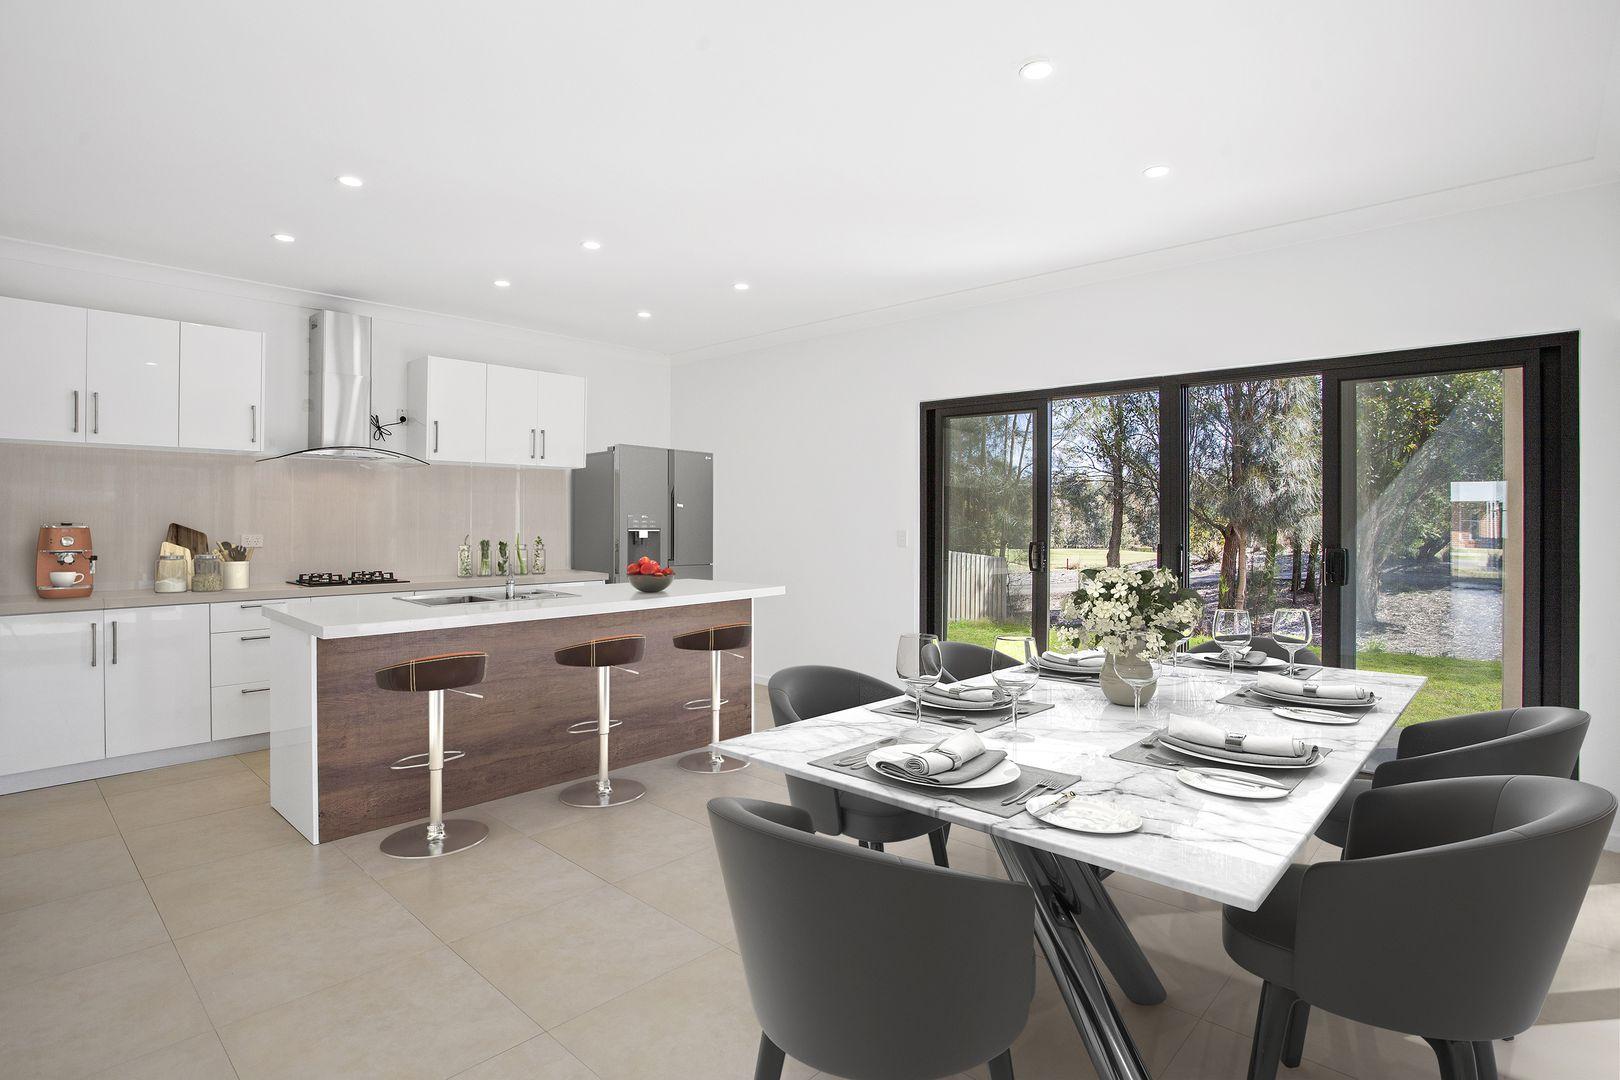 35 Windsorgreen Drive, Wyong NSW 2259, Image 2